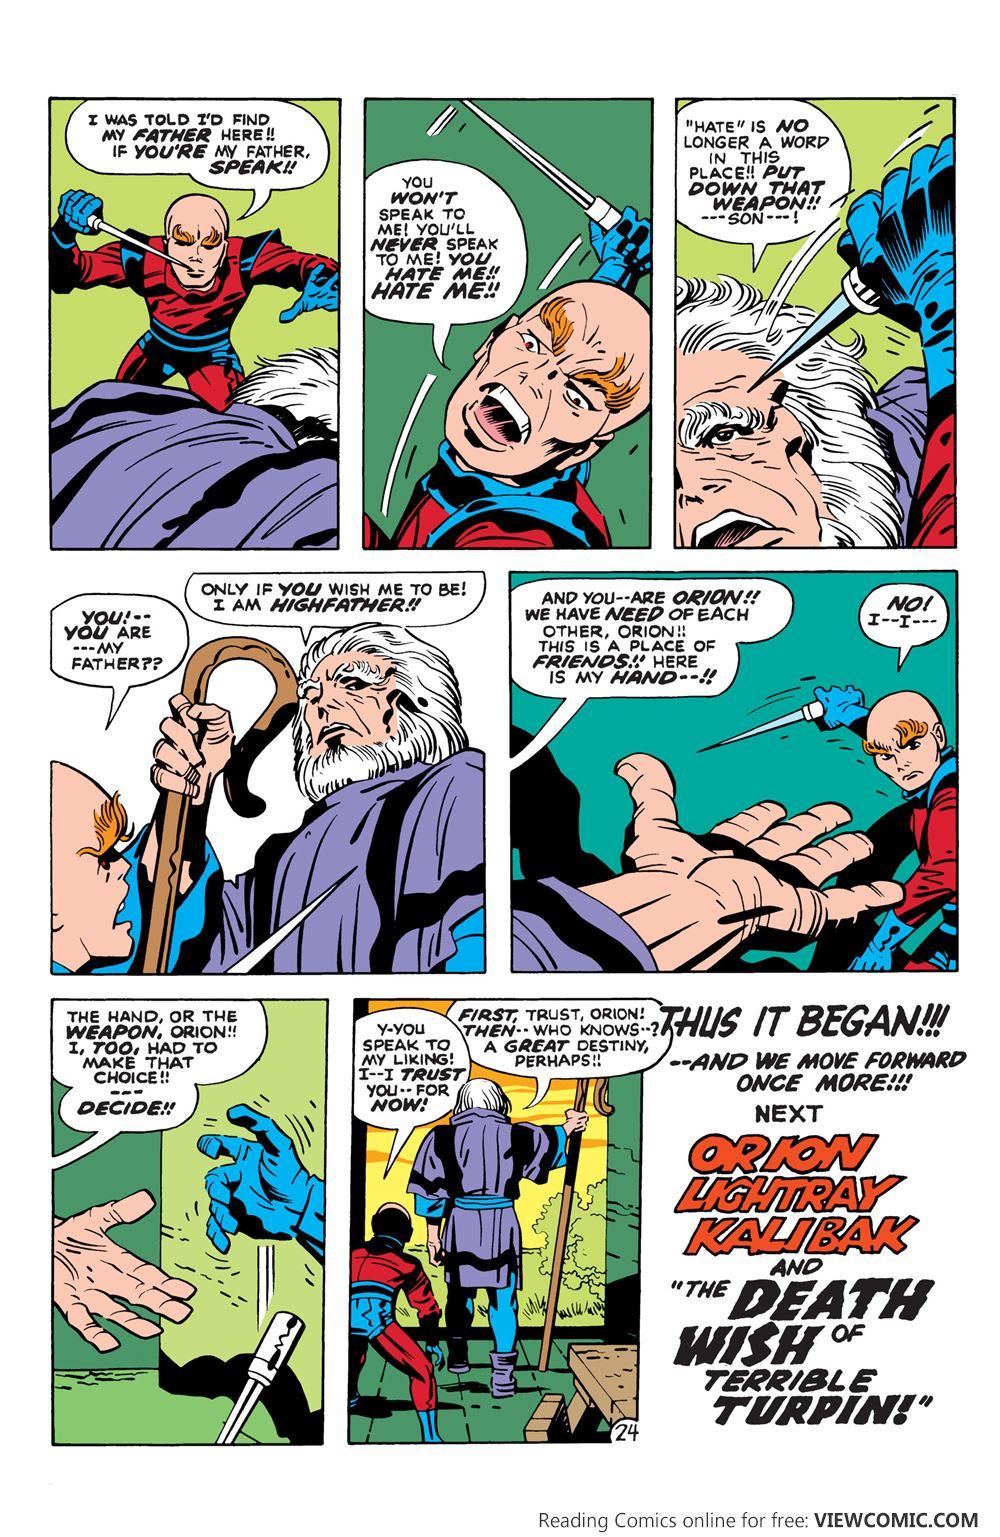 DC Comics Presents – Darkseid War 100-Page Spectacular